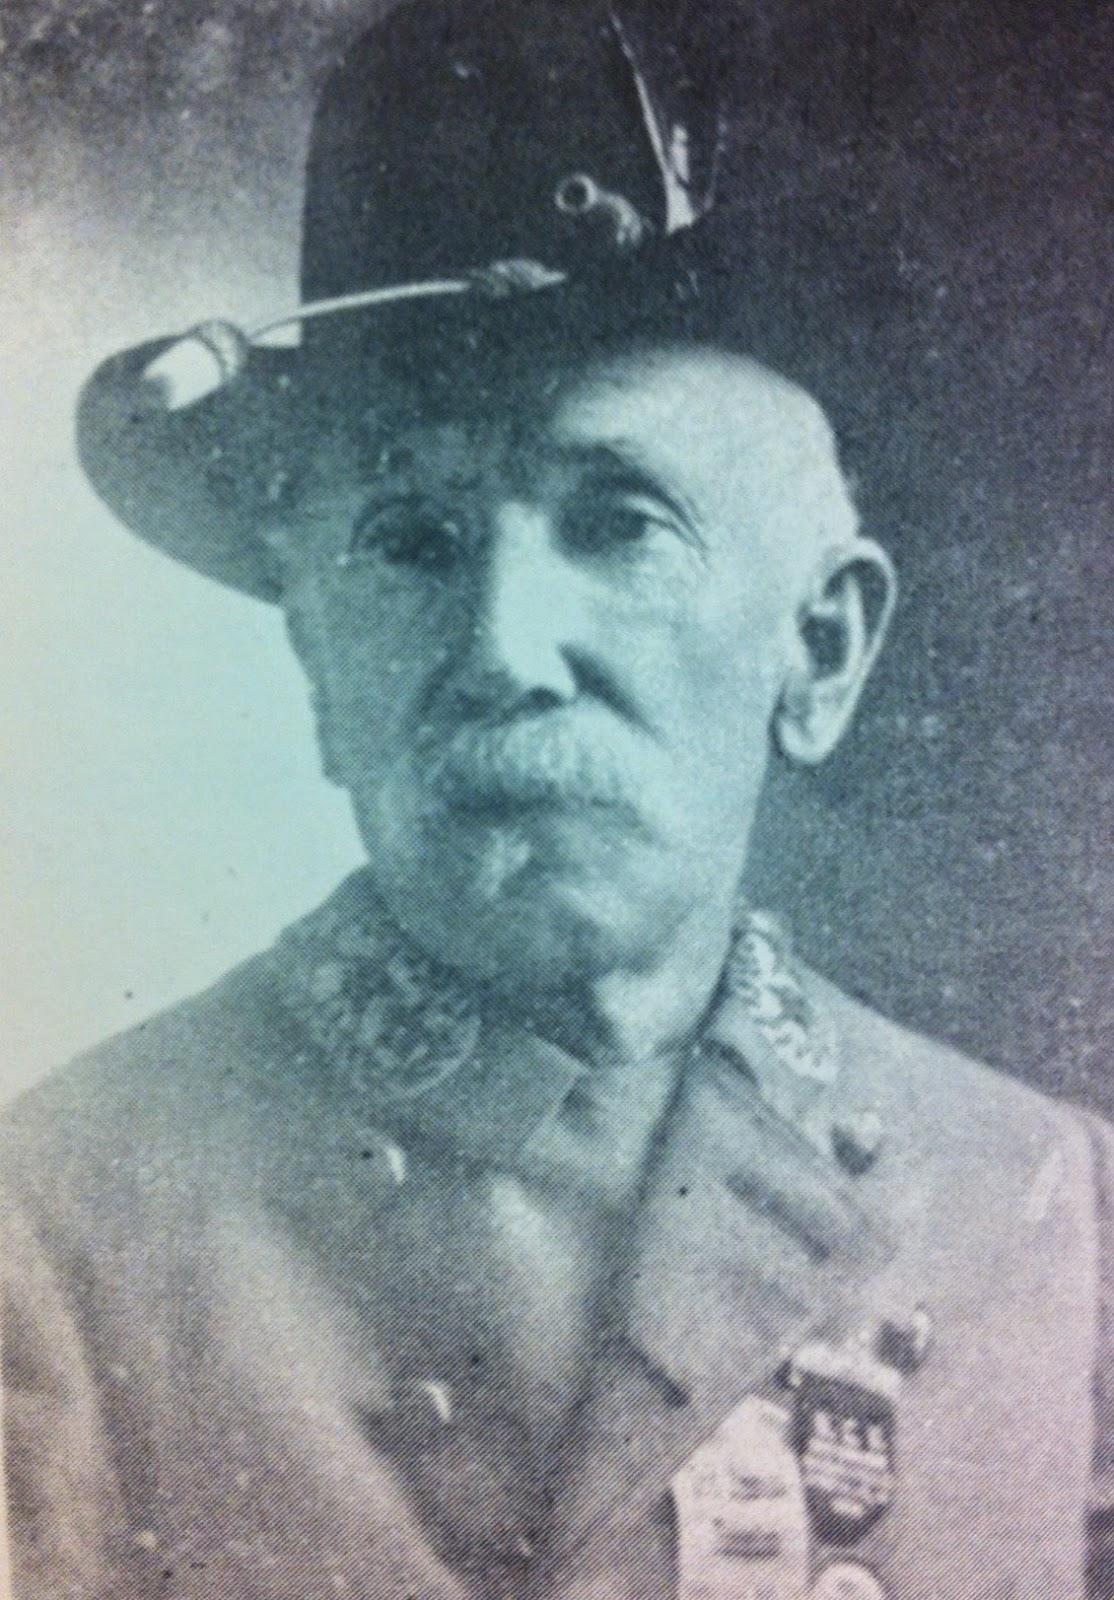 Alabama conecuh county brooklyn 36429 -  History Of Brooklyn Alabama Tells Of Area S Civil War Experiences